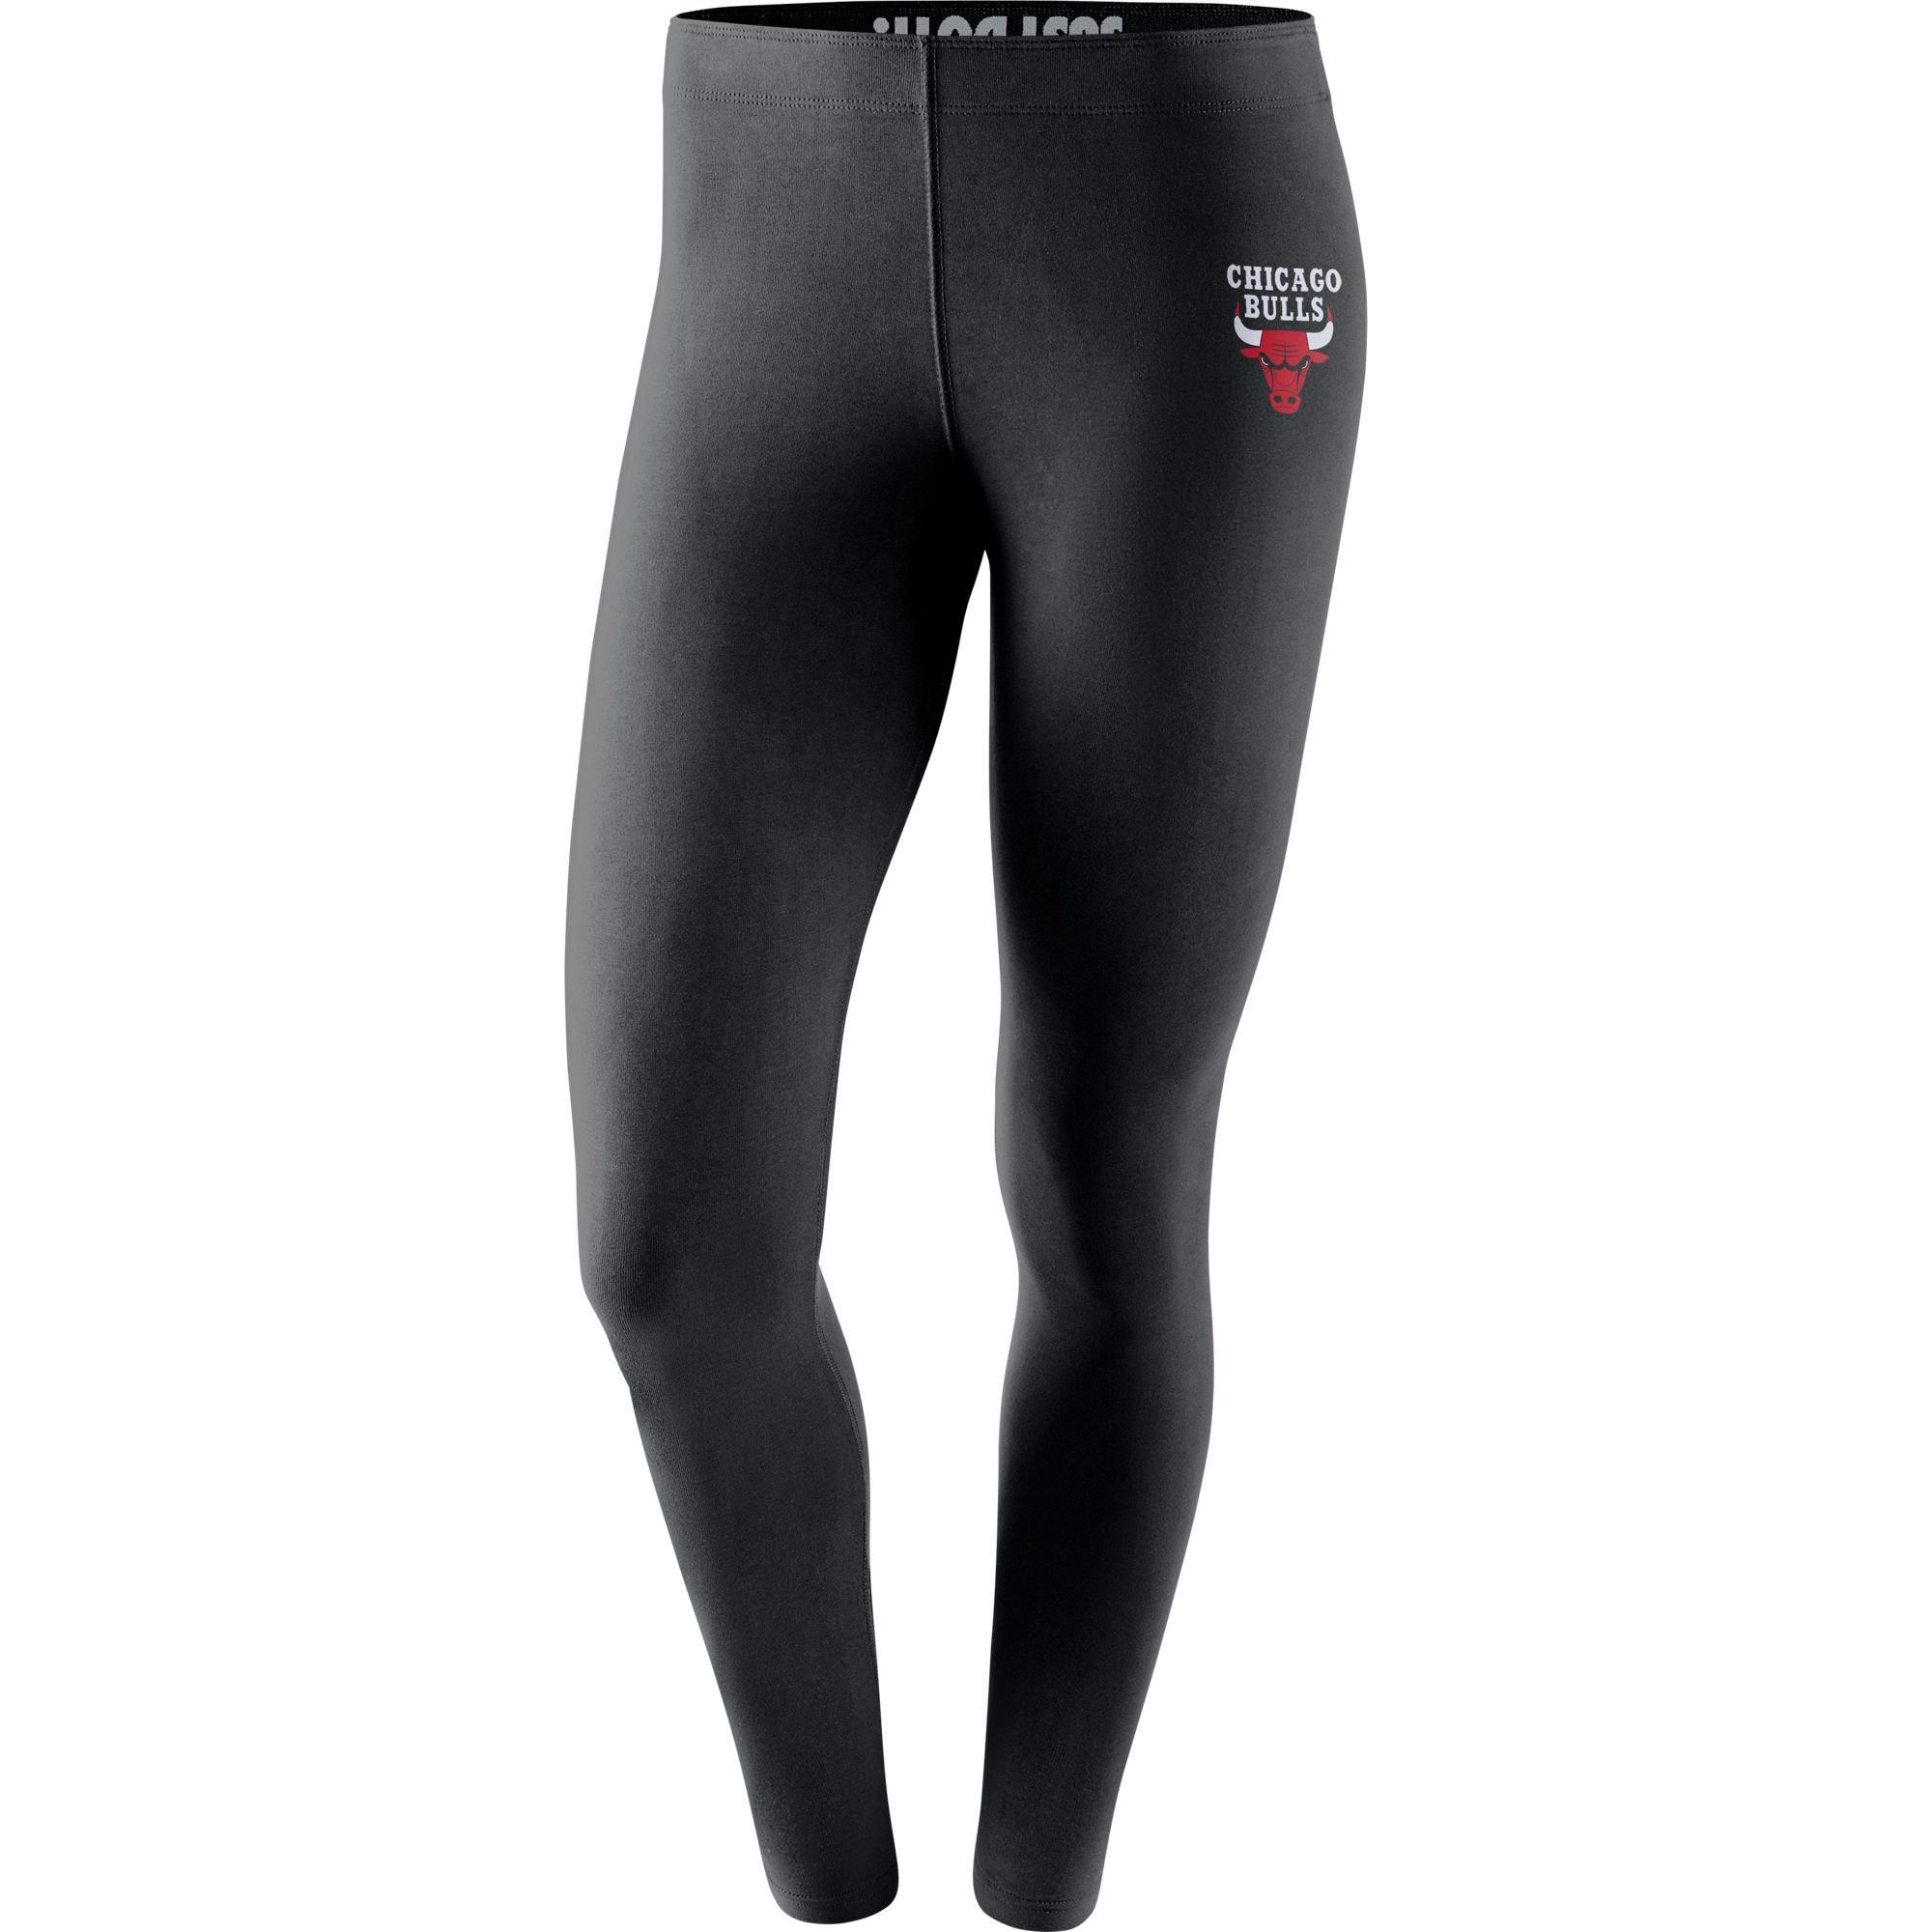 Chicago Bulls Nike Women's Leg-A-See Tights - Black